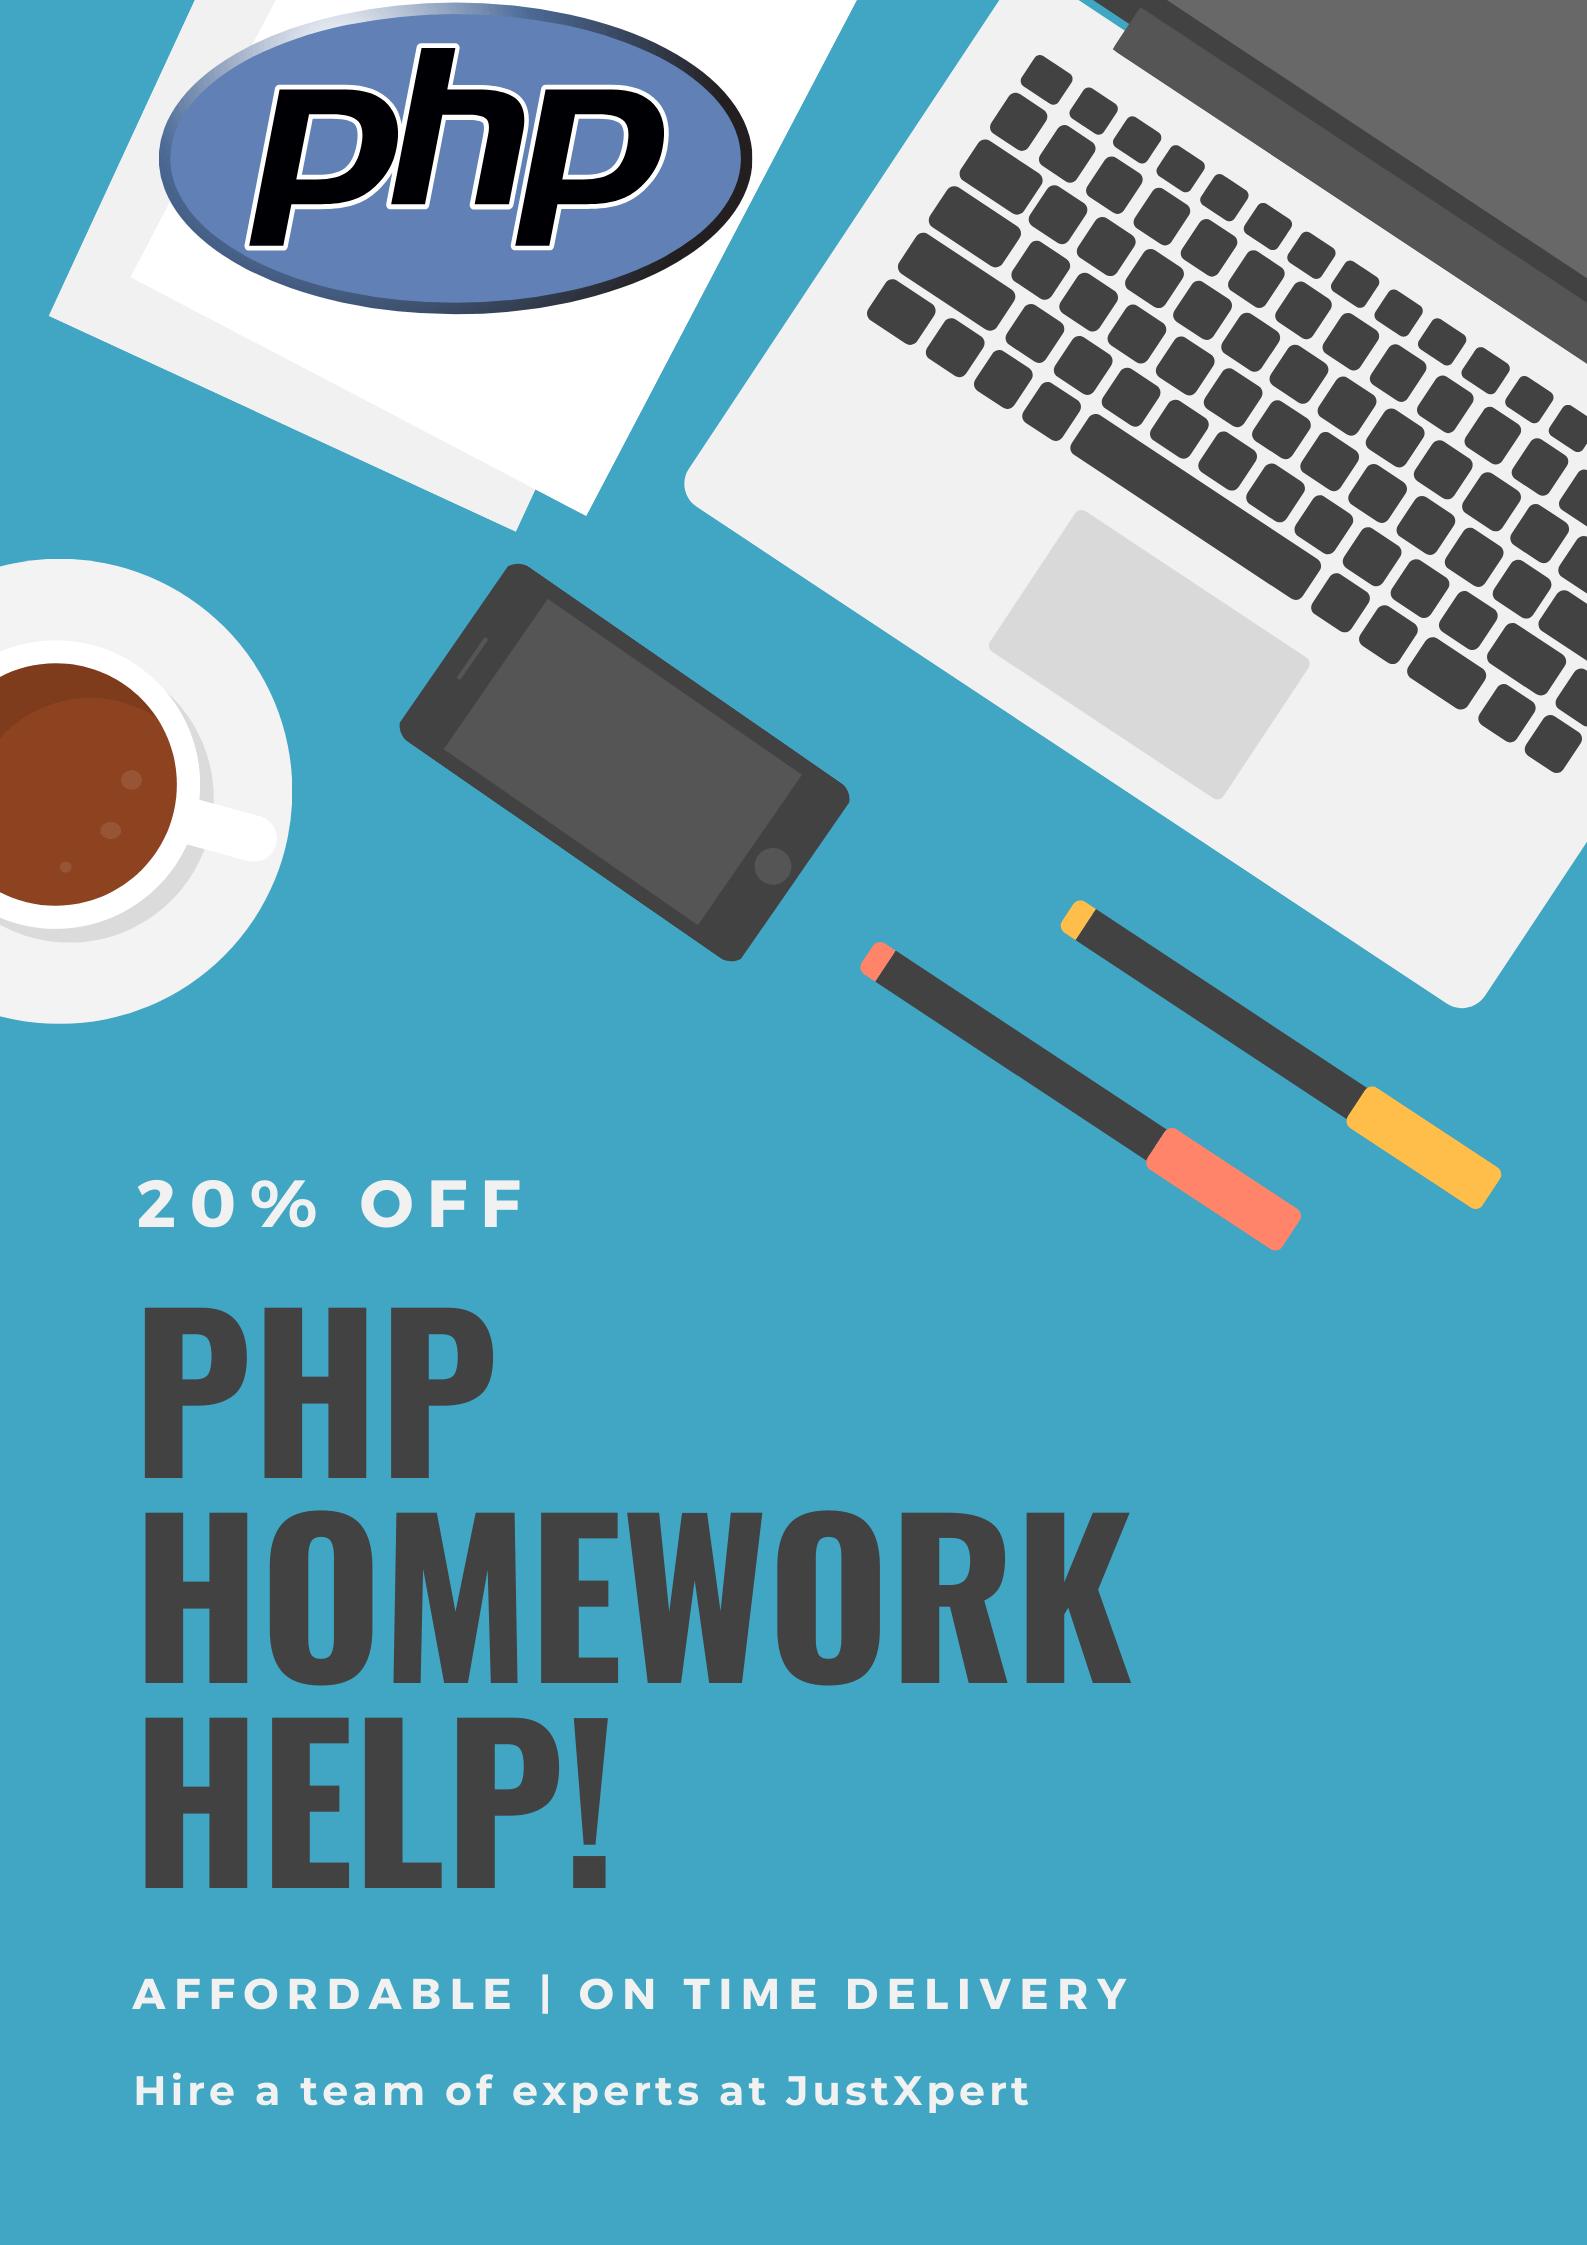 Get PHP Homework Help